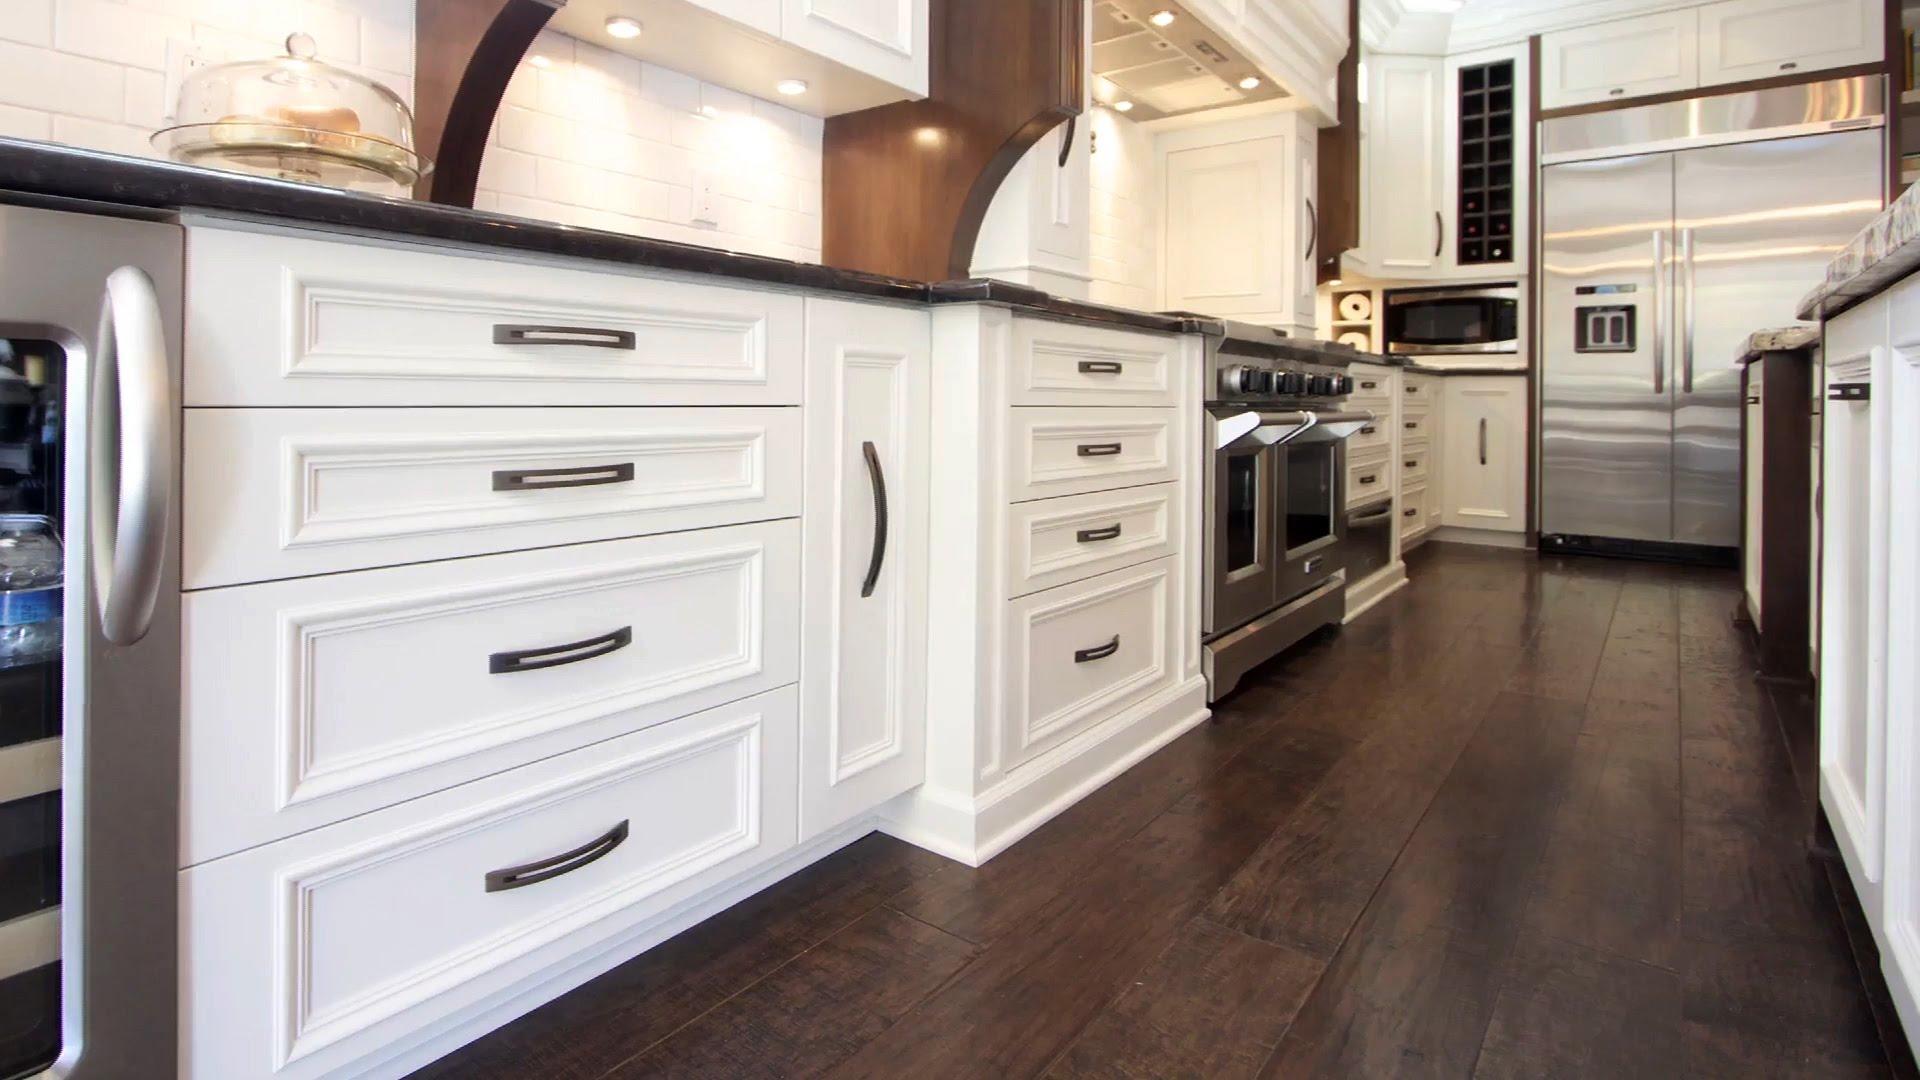 & 20 Gorgeous Flooring Ideas For the Kitchen